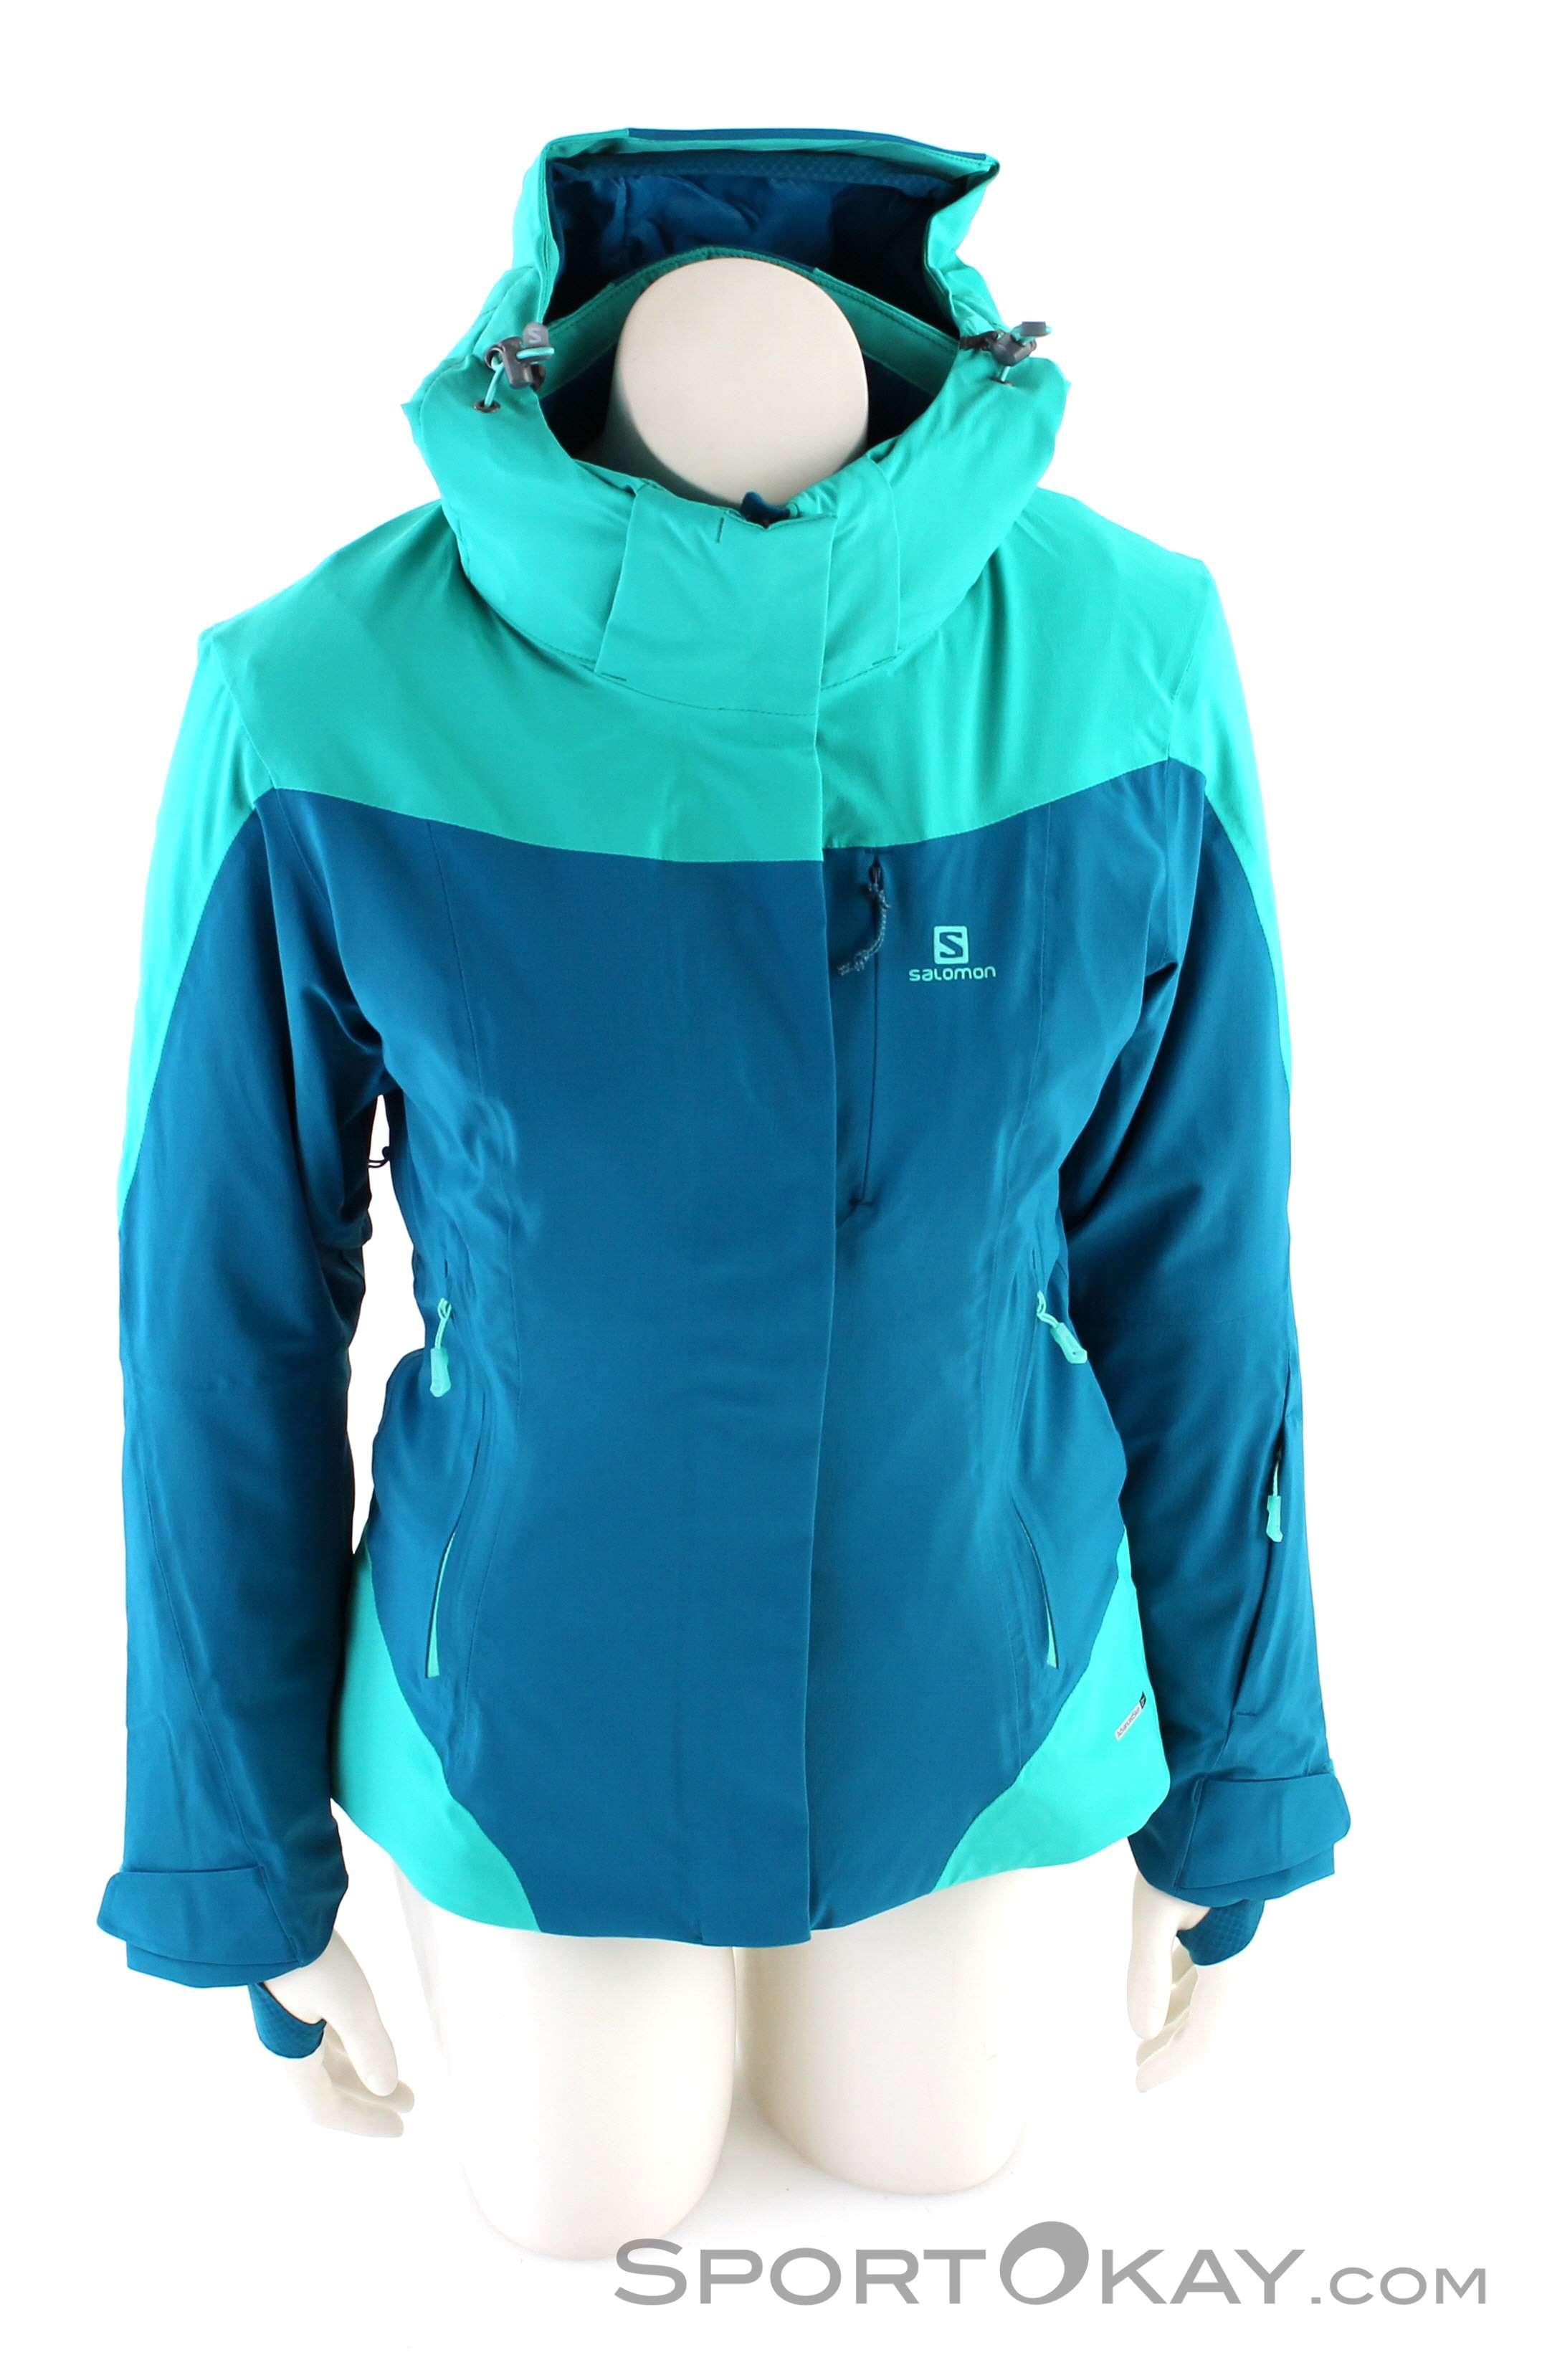 Salomon Salomon Icerocket Jacket Damen Skijacke